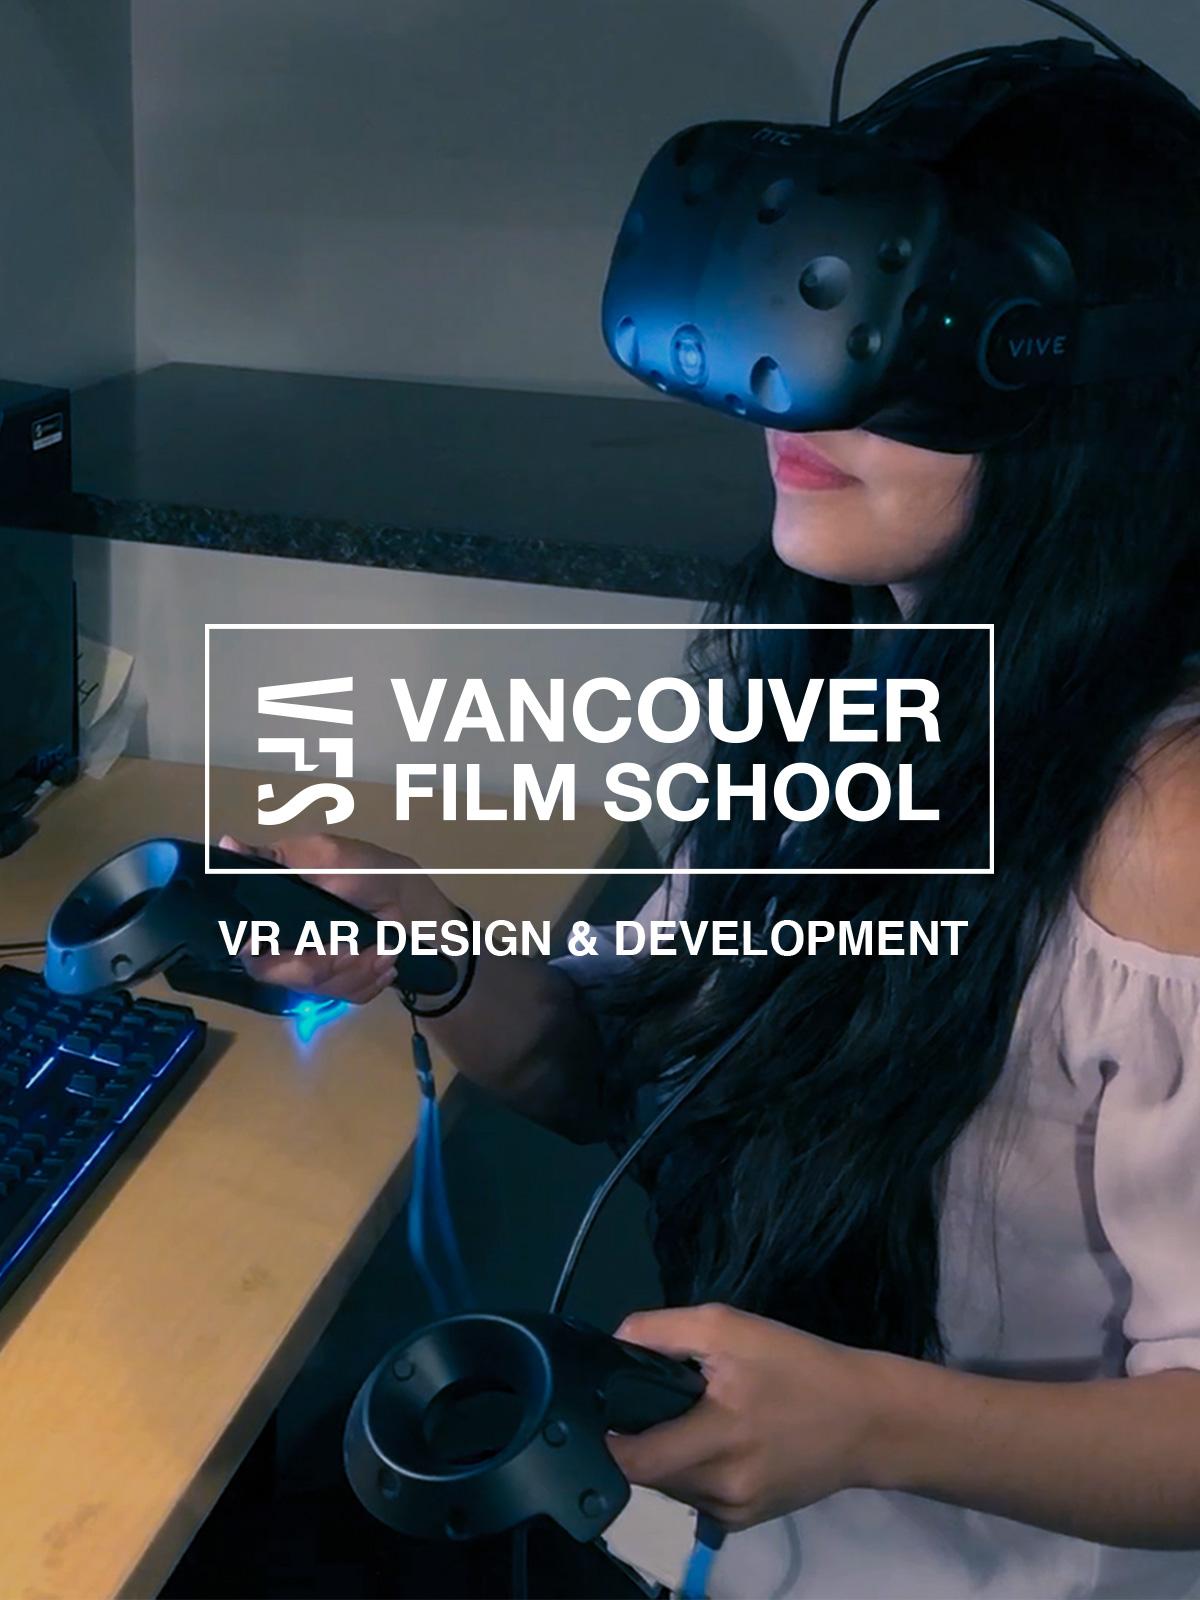 Vfs Introduces Vr/ar Design & Development